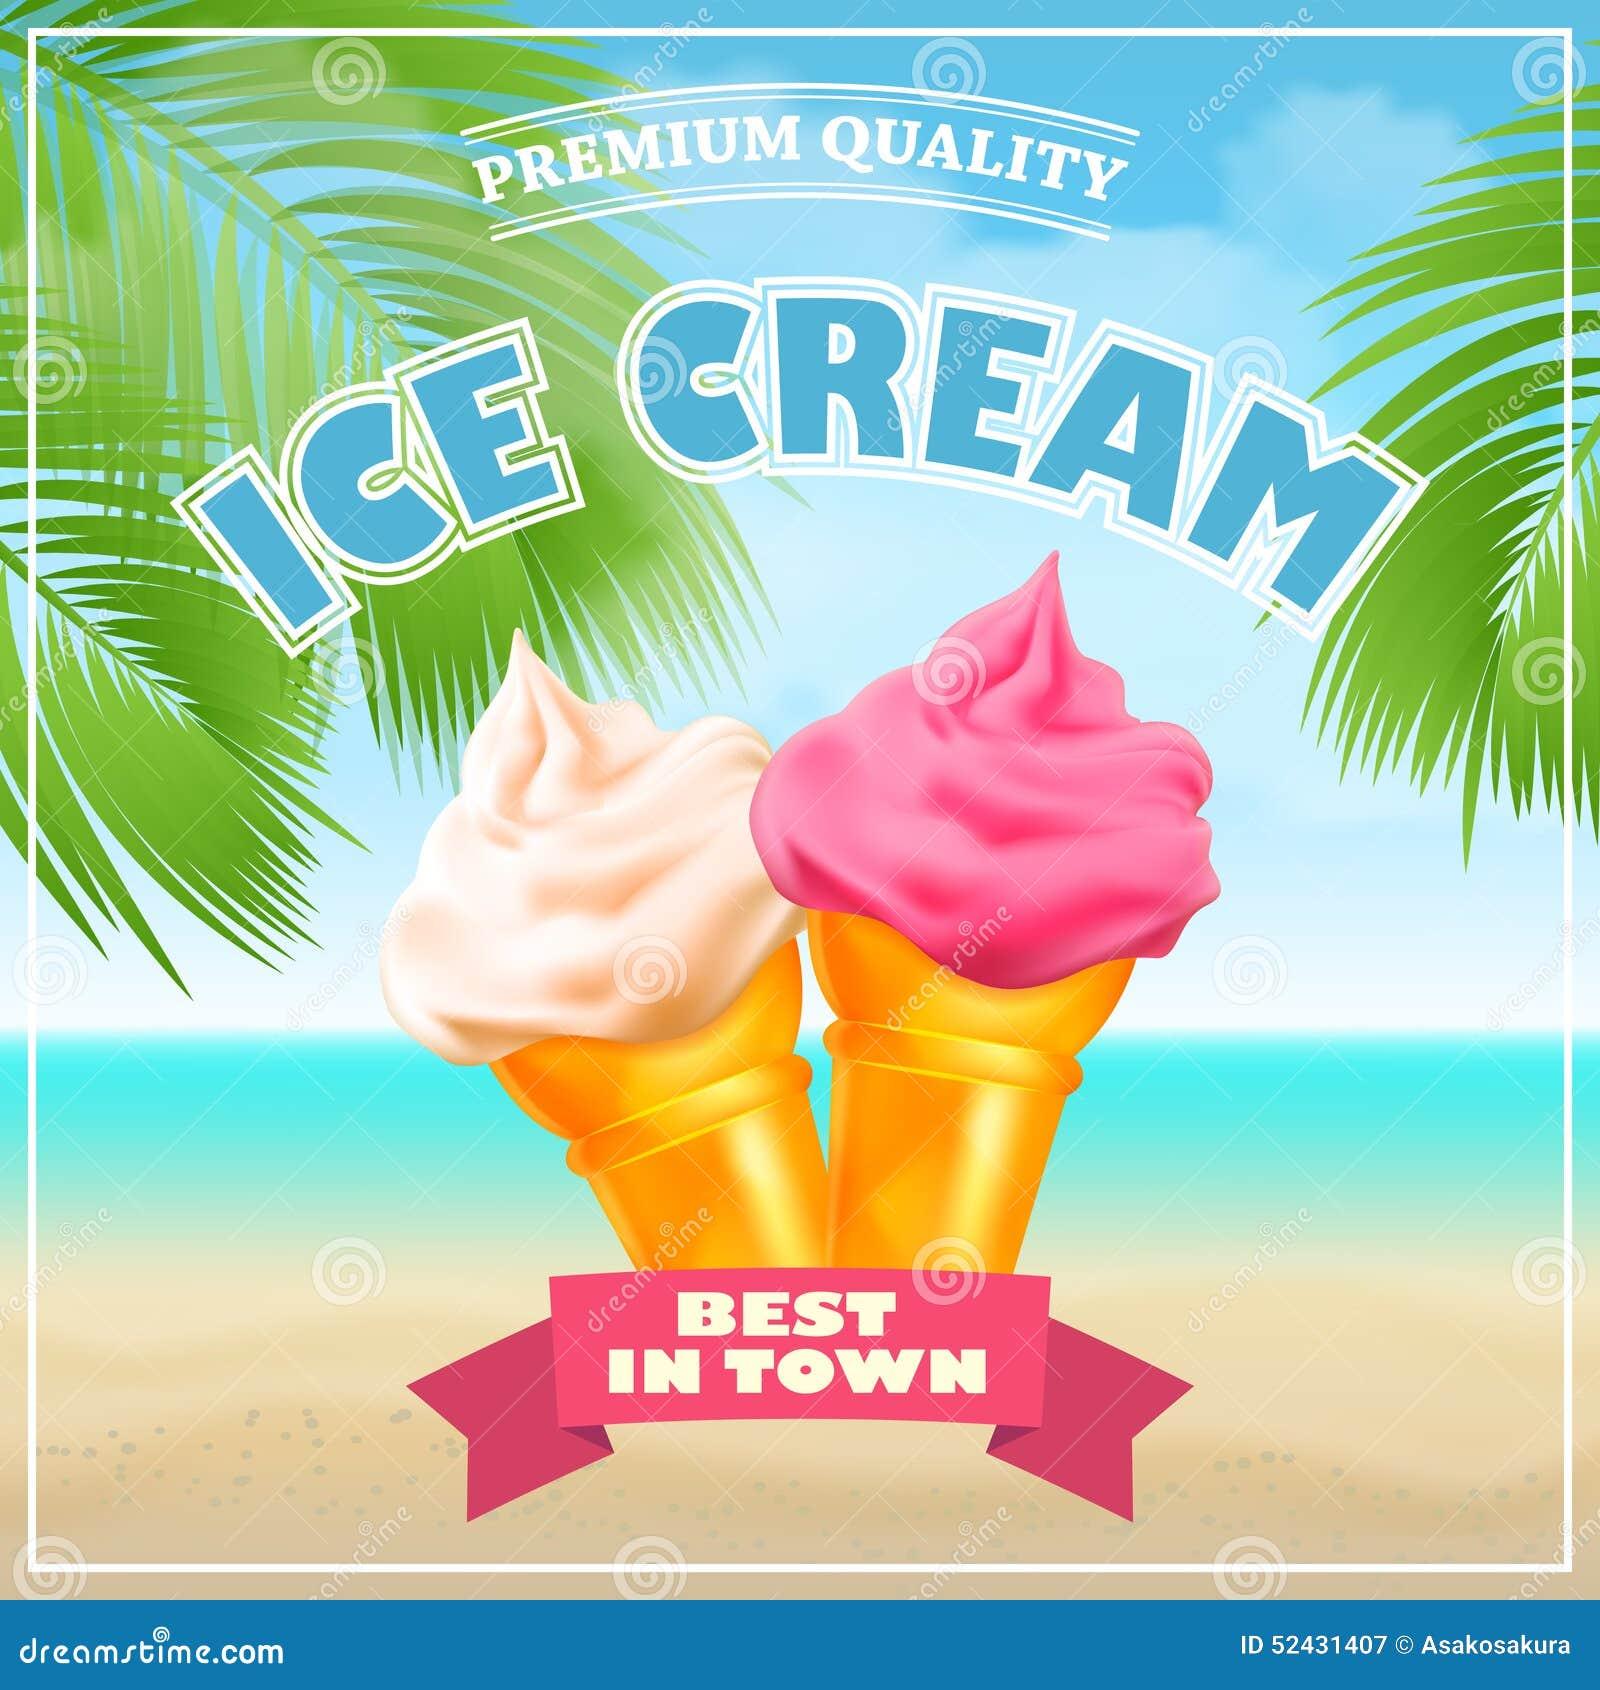 Ice Cream Poster Stock Image - Image: 31564511